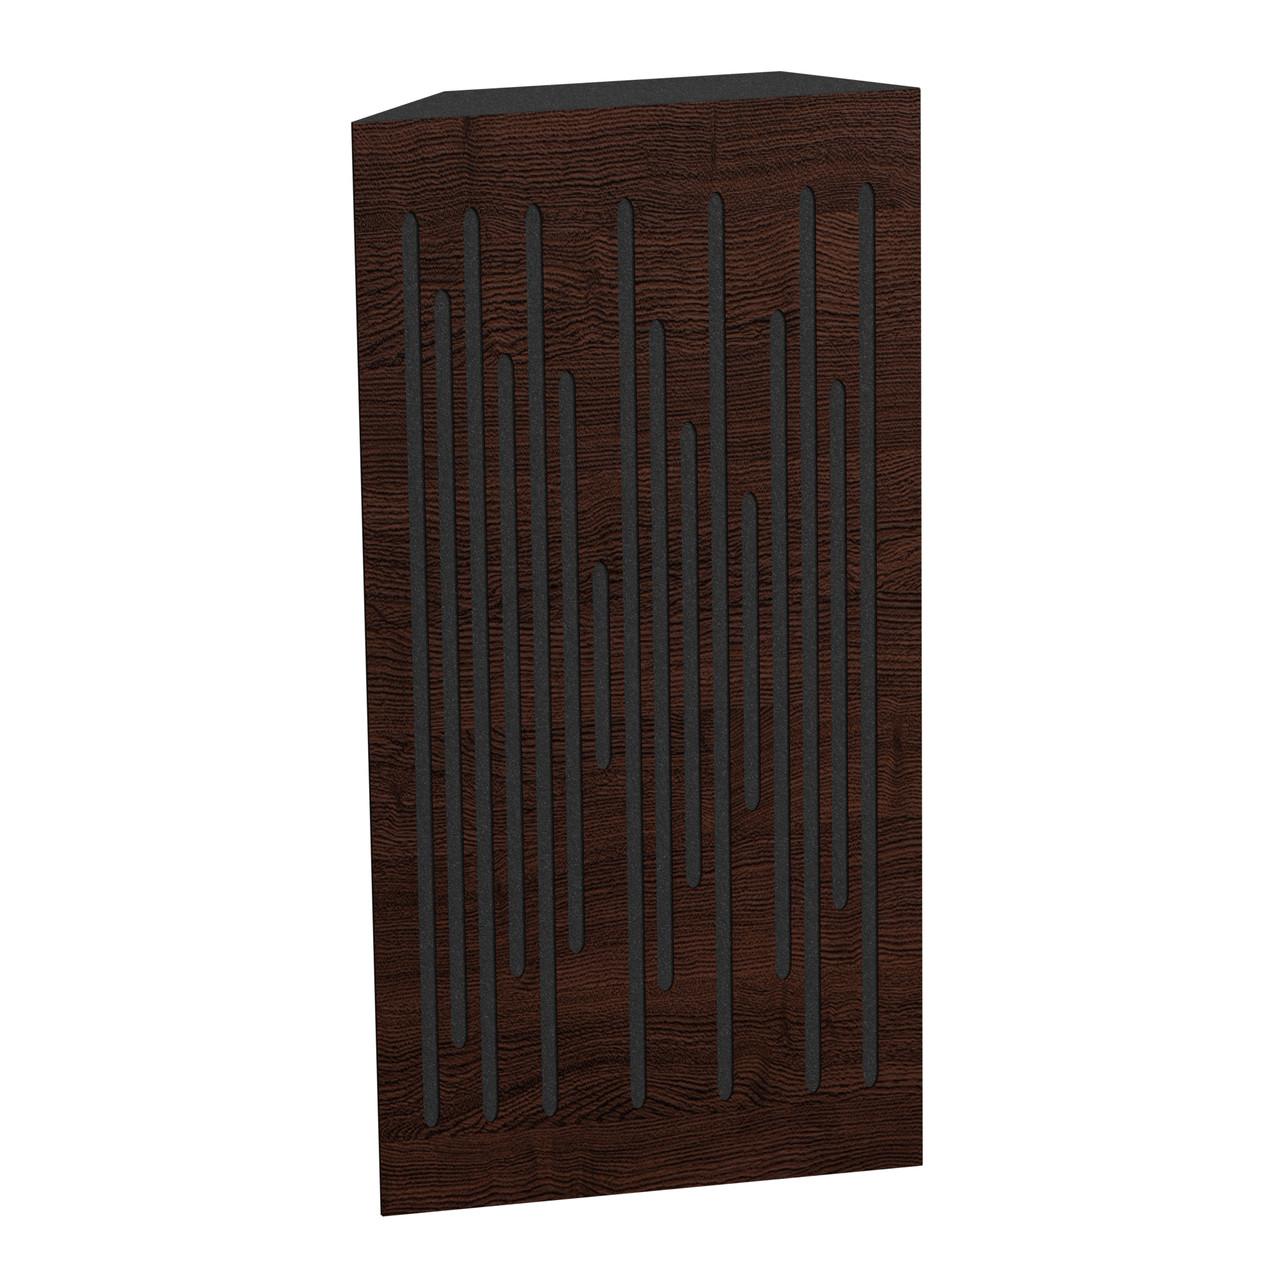 Бас пастка Ecosound Bass trap Ecowave wood 1000х500х100 колір венге